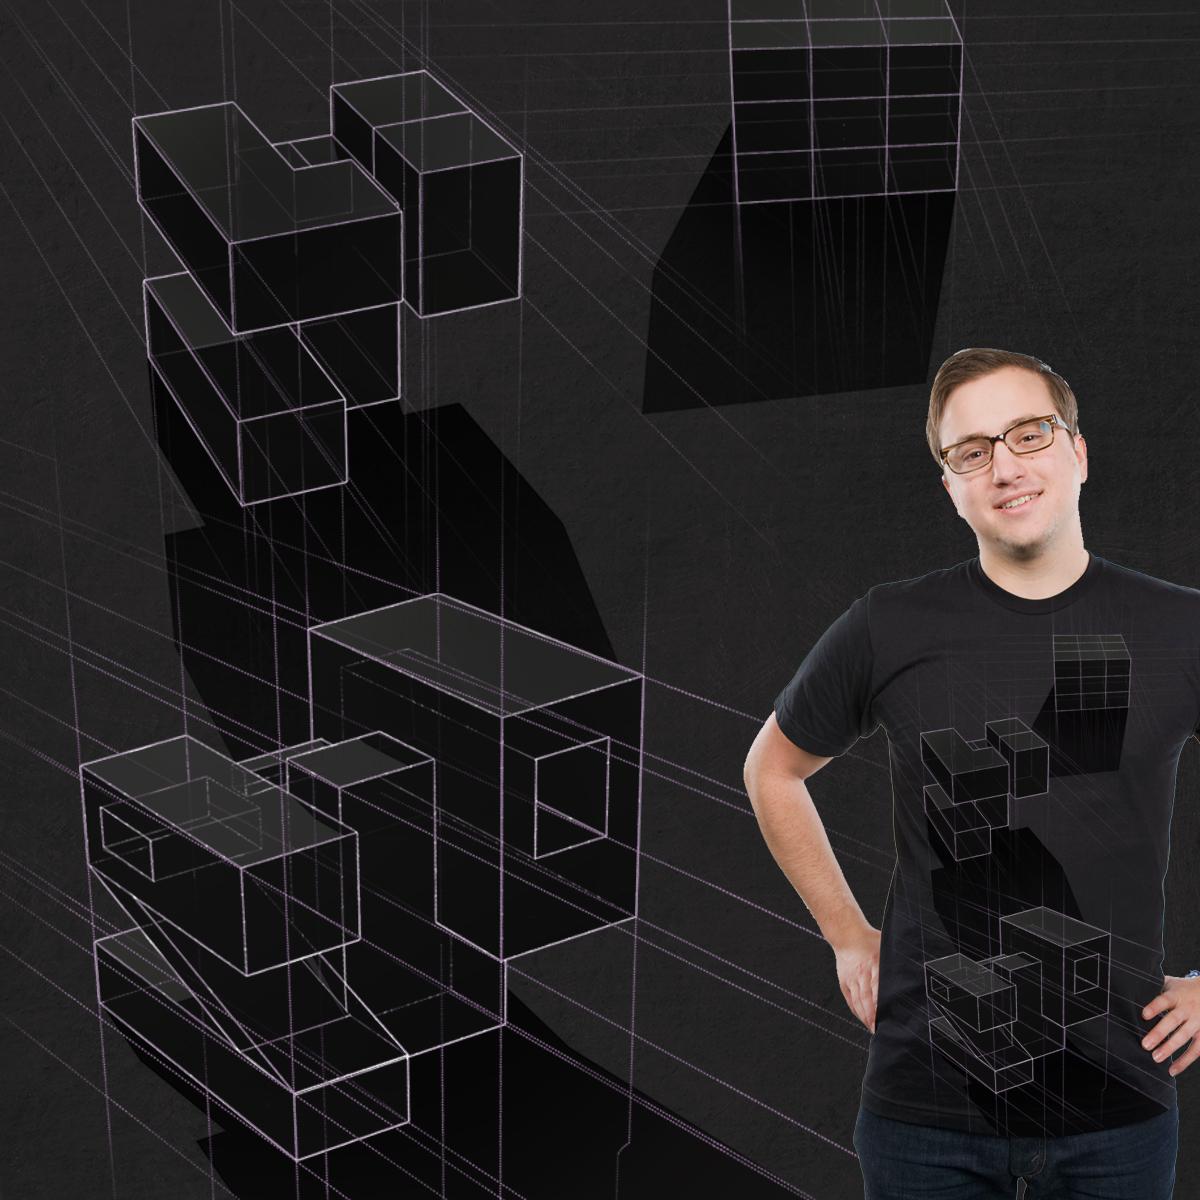 Cubic Progression by TenkenNoShin on Threadless